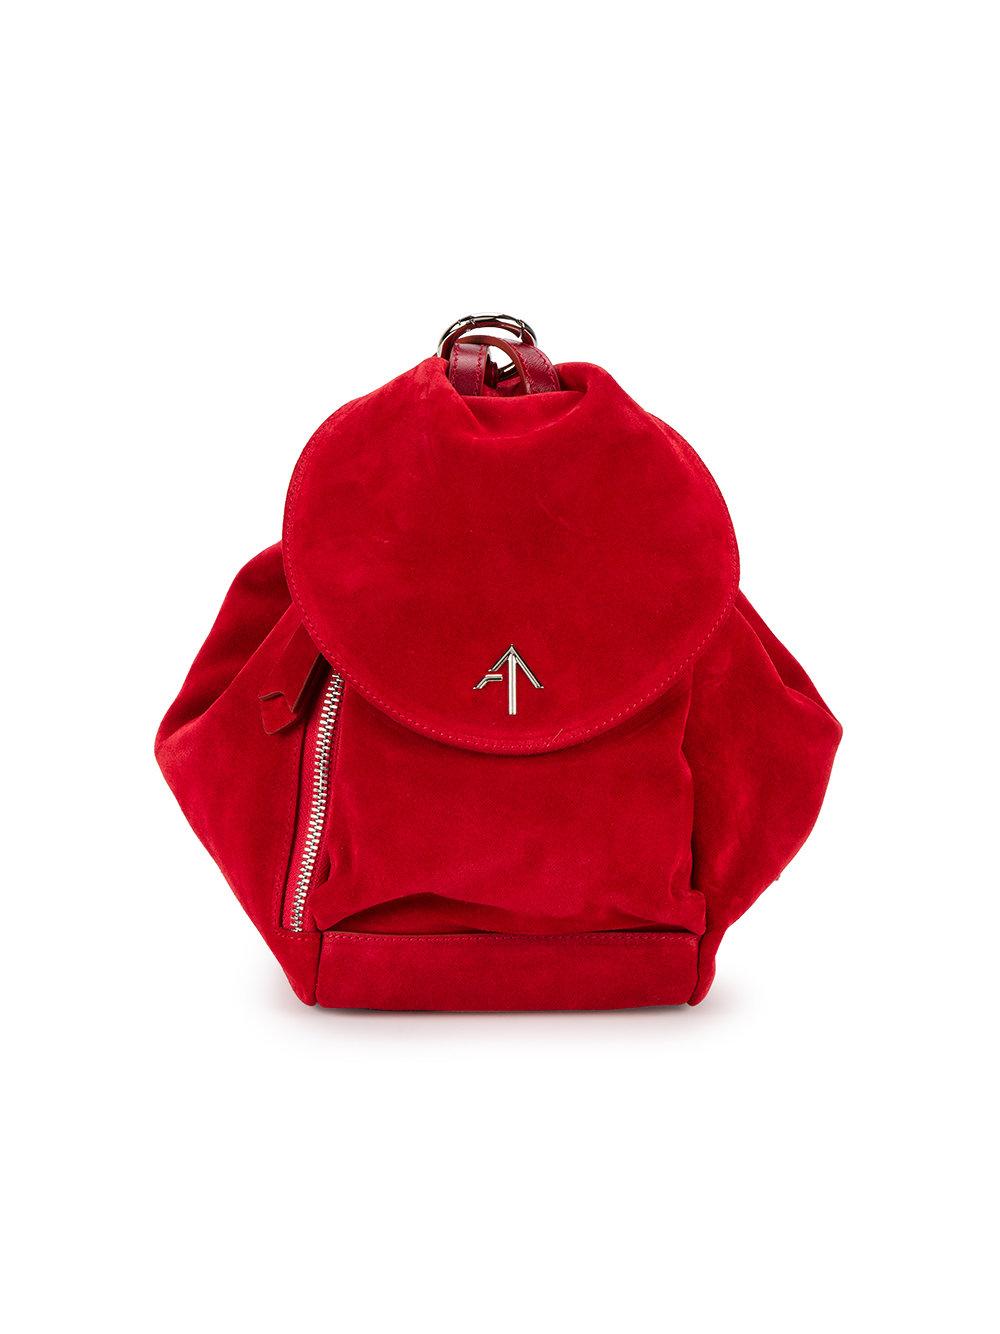 MANU ATELIER backpack - $520